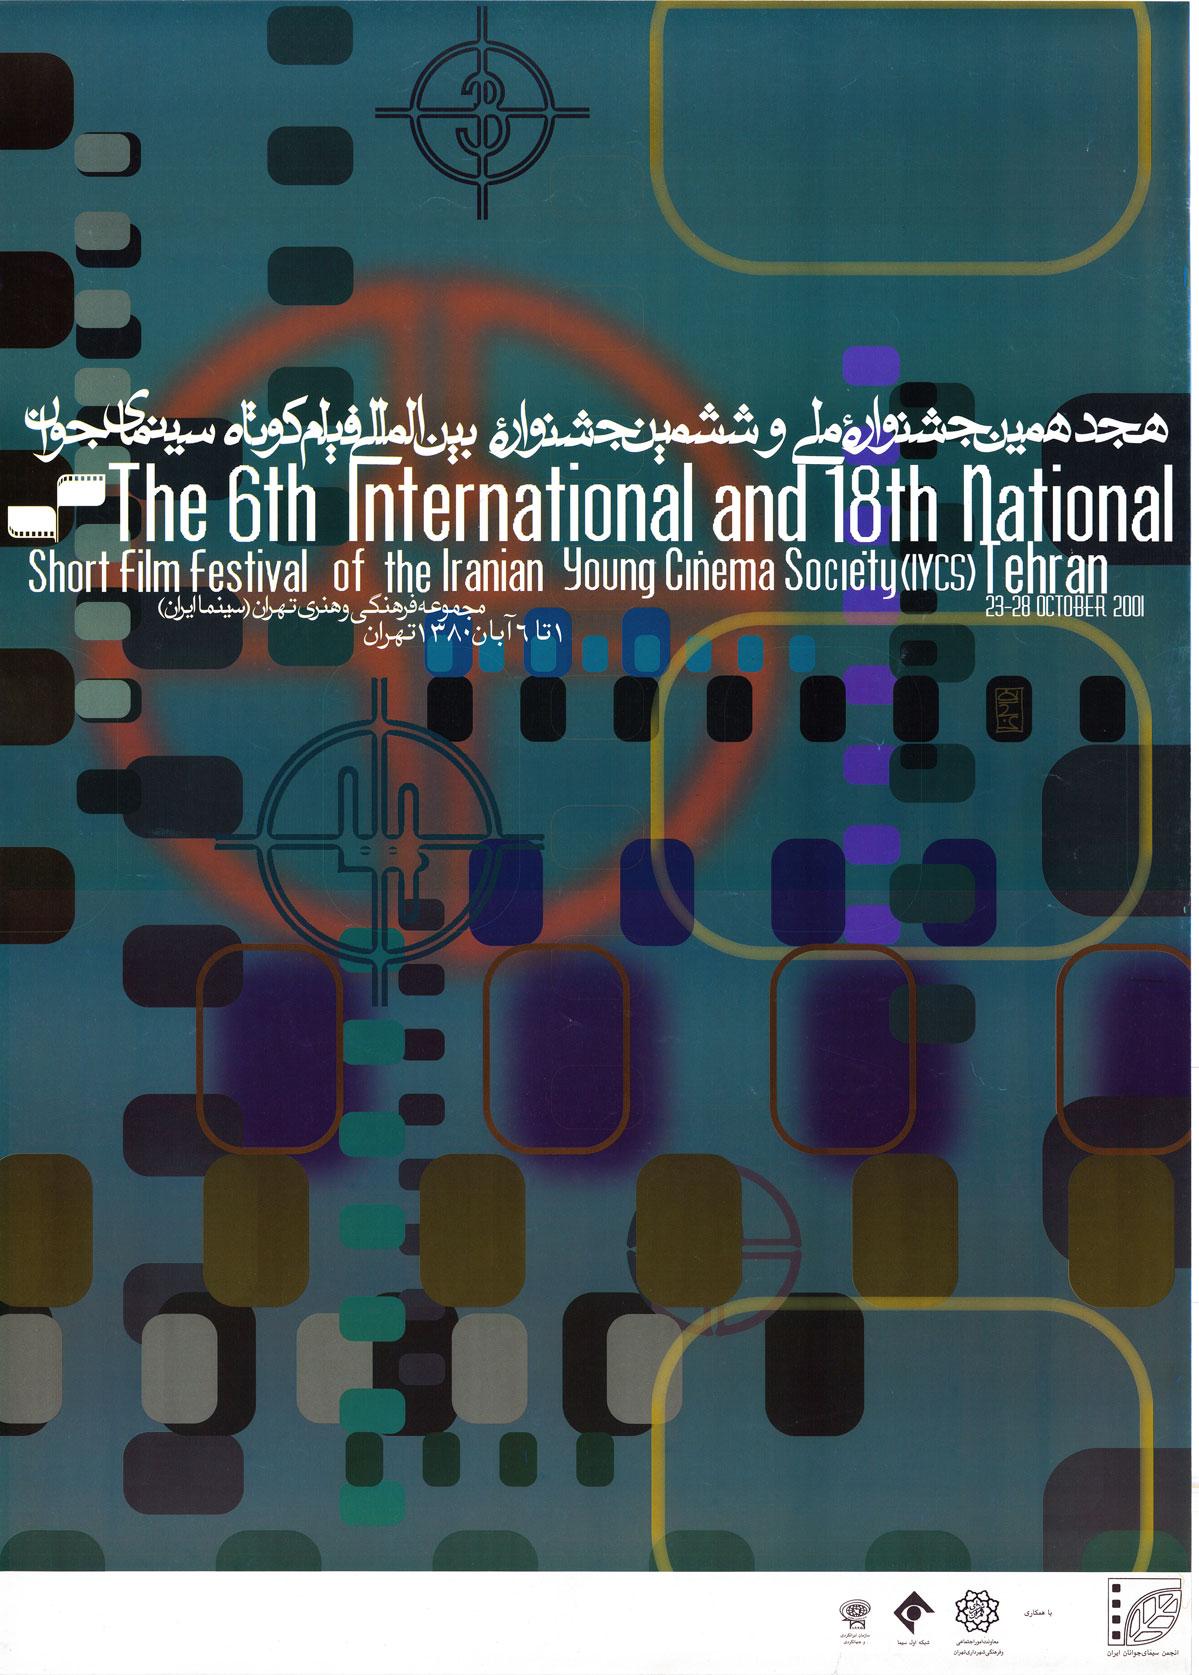 18th Festival 2001